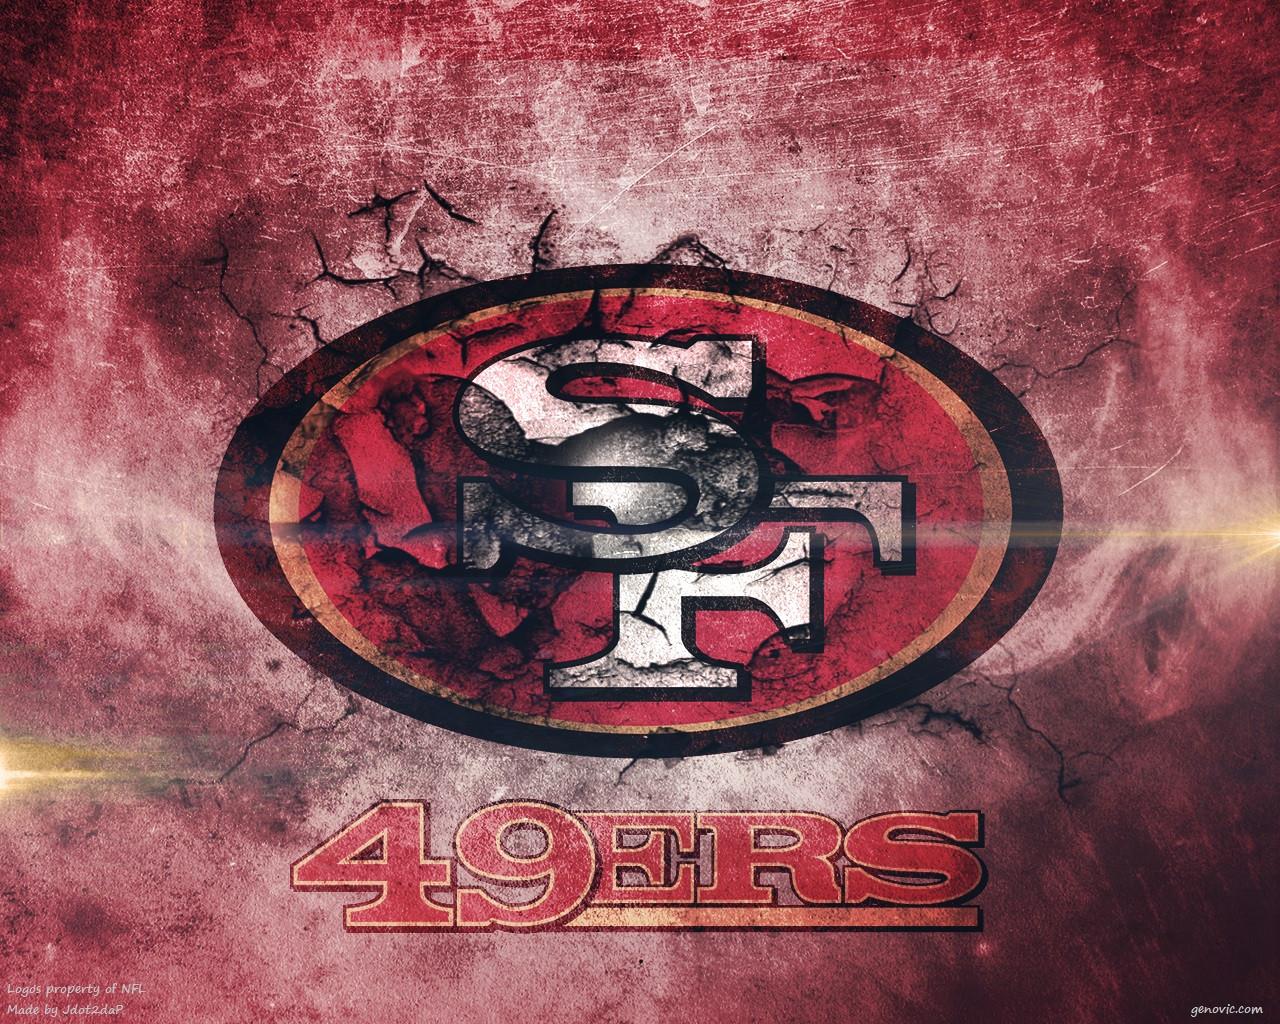 San Francisco 49ers Wallpapers 2015 1280x1024